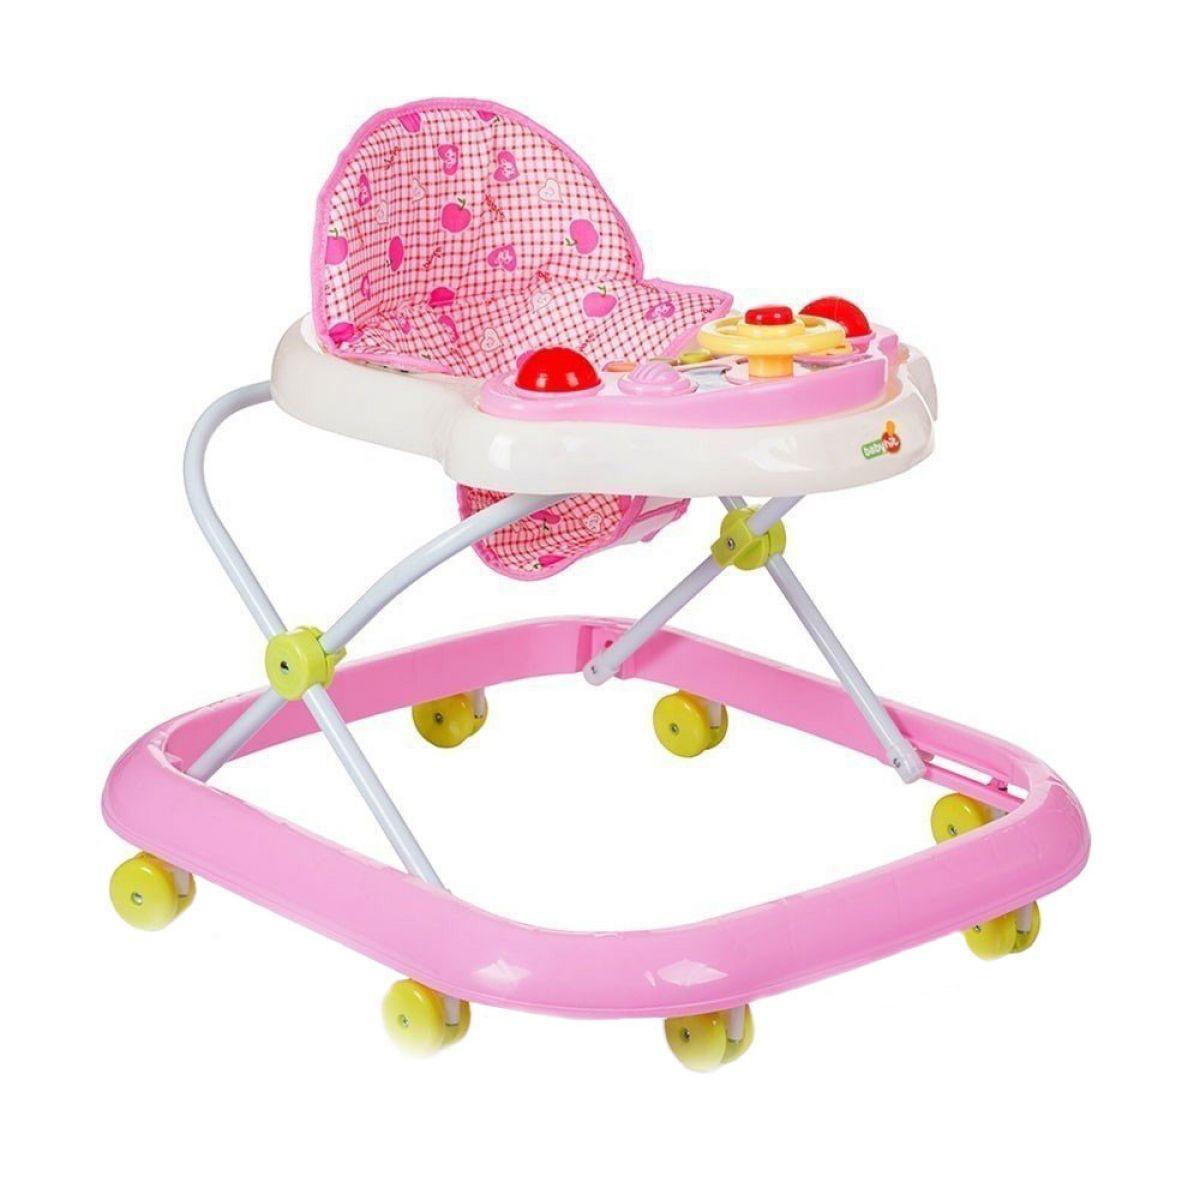 Ходунки Action, розовые, Babyhit (21 735)